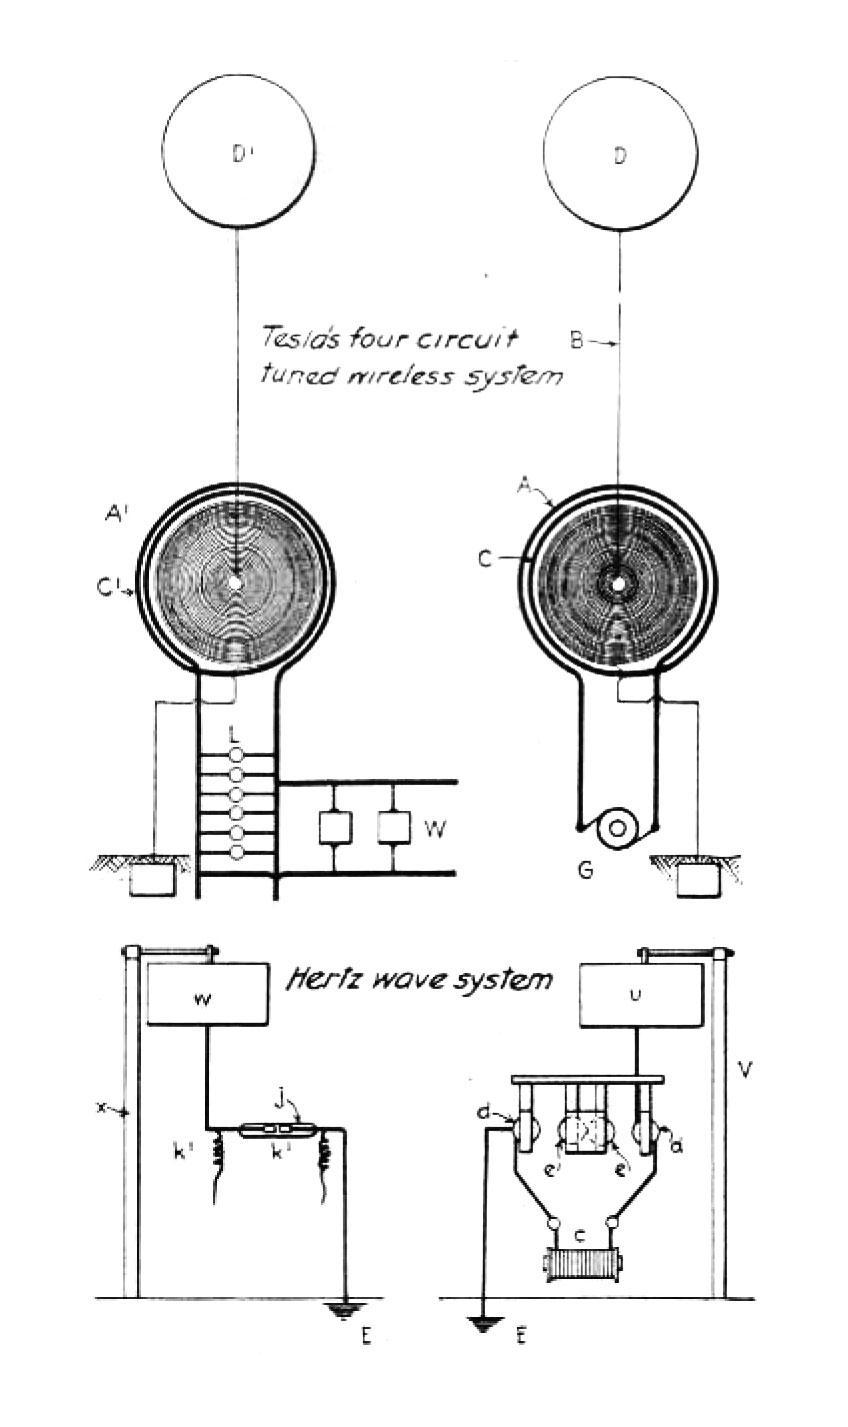 medium resolution of diagram of tesla s four circuit tuned system